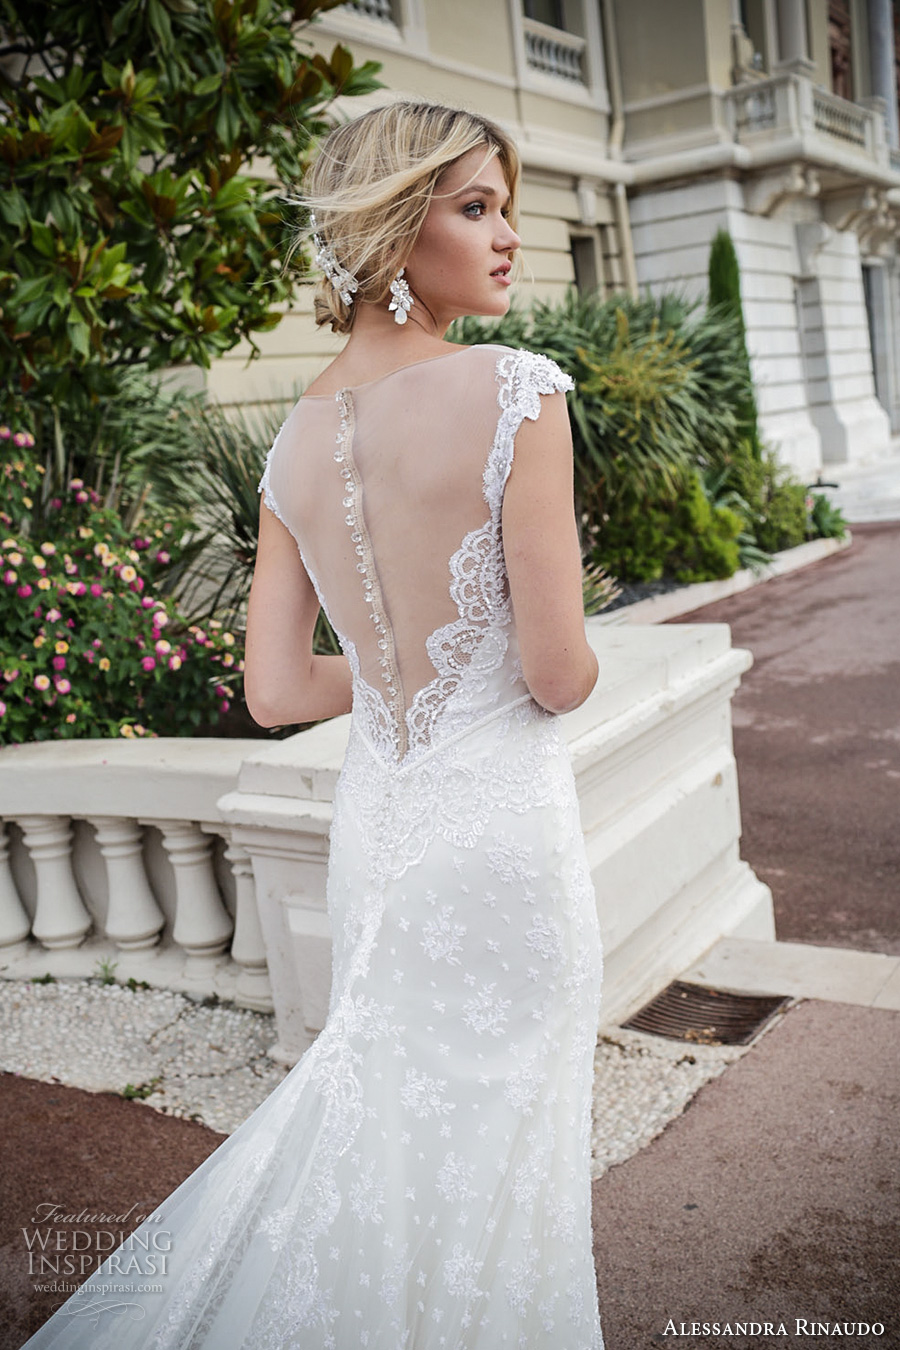 alessandra rinaudo 2017 bridal cap sleeves illusion boat deep plunging neckline full embellishment elegant sheath wedding dress illusion back royal long train (3) zbv